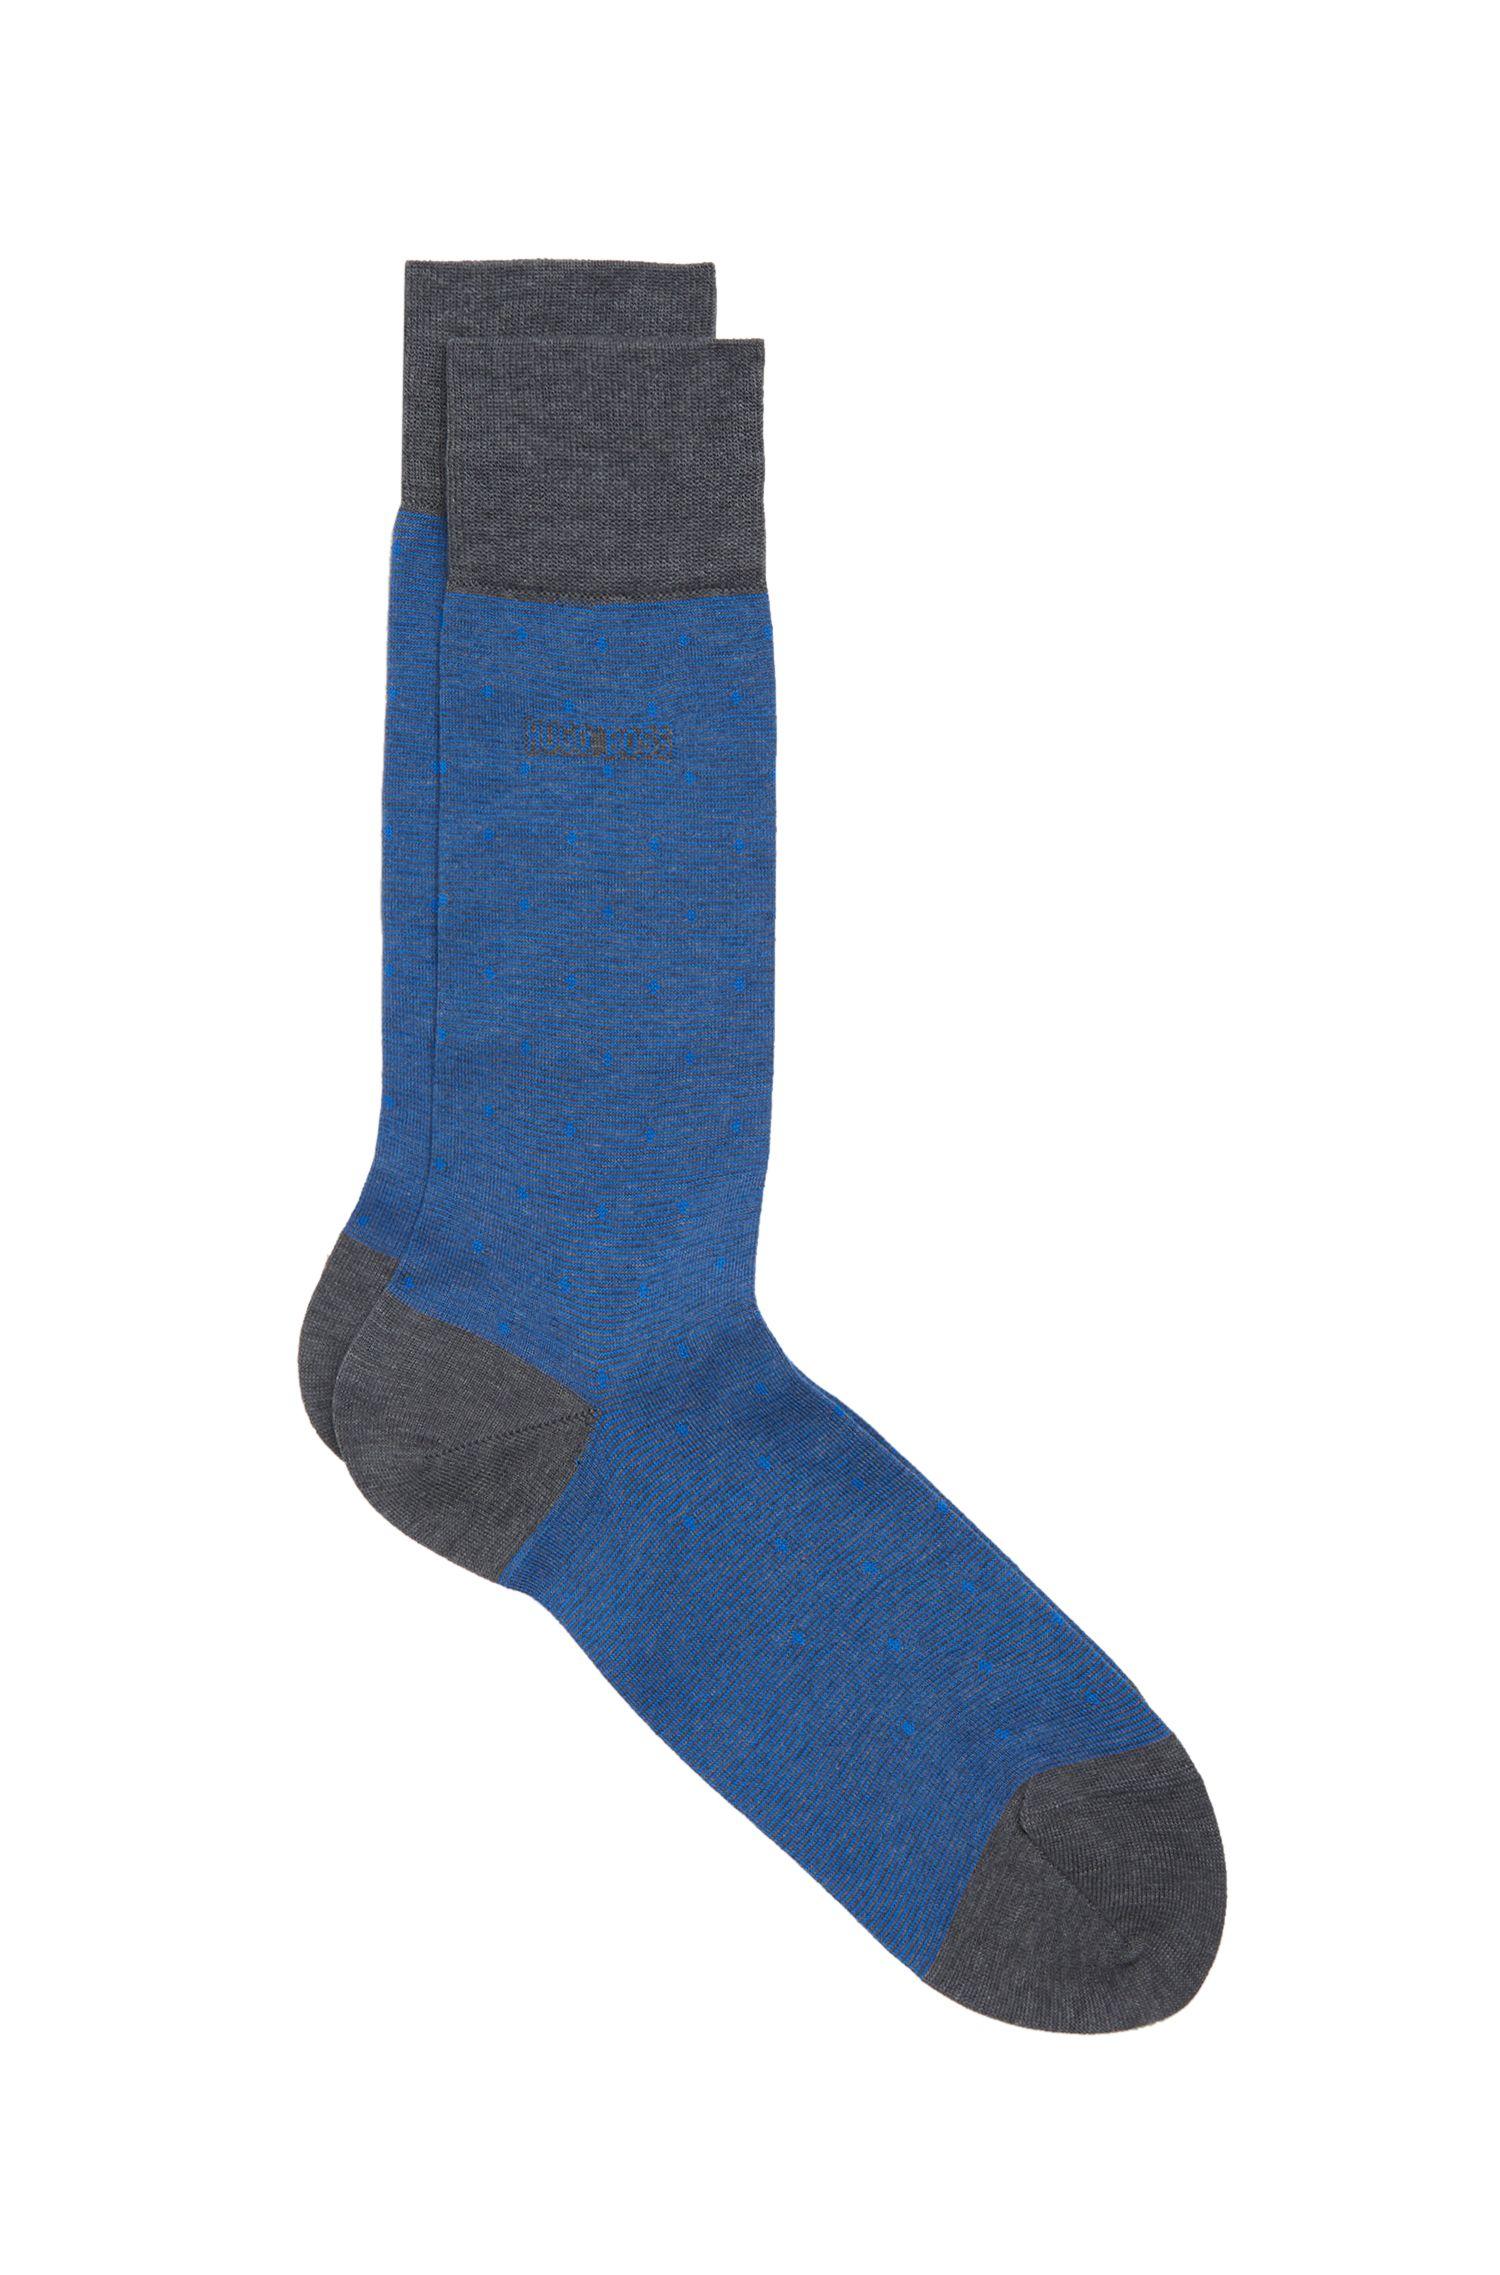 'Paul Design Dots US' | Stretch Cotton Blend Socks